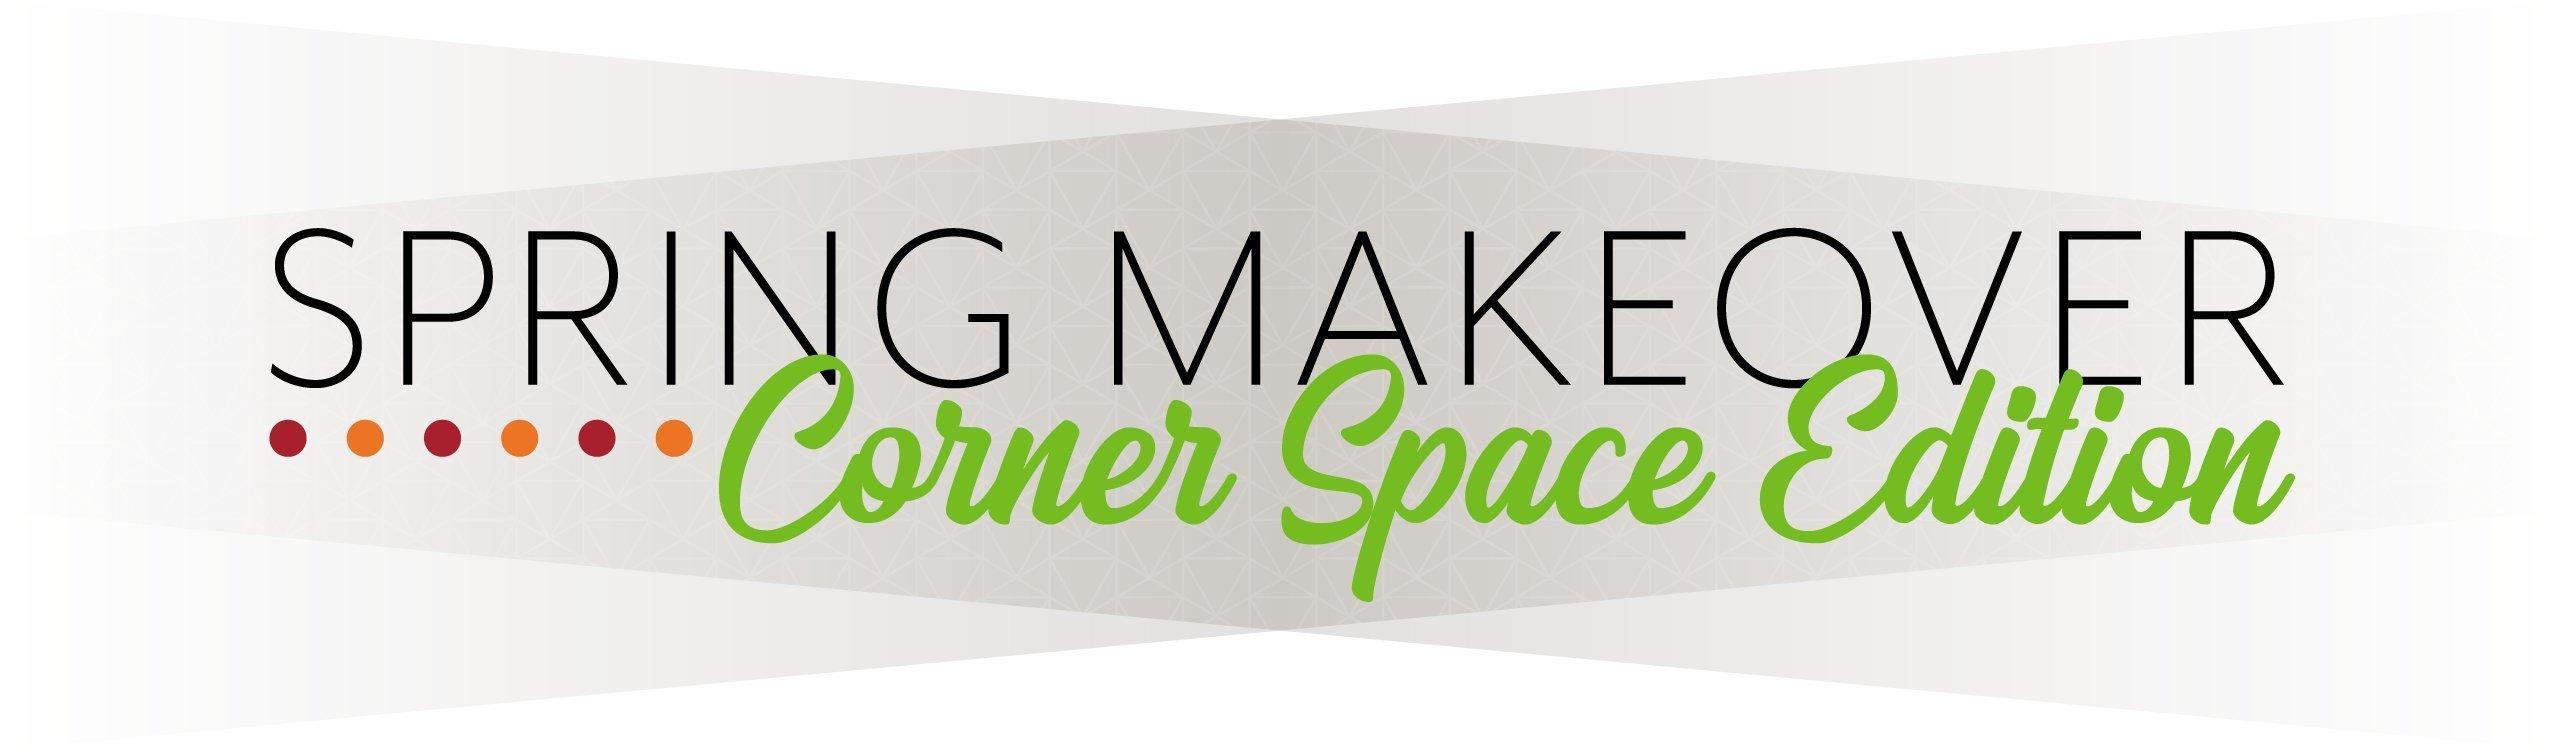 Corner Space Edition